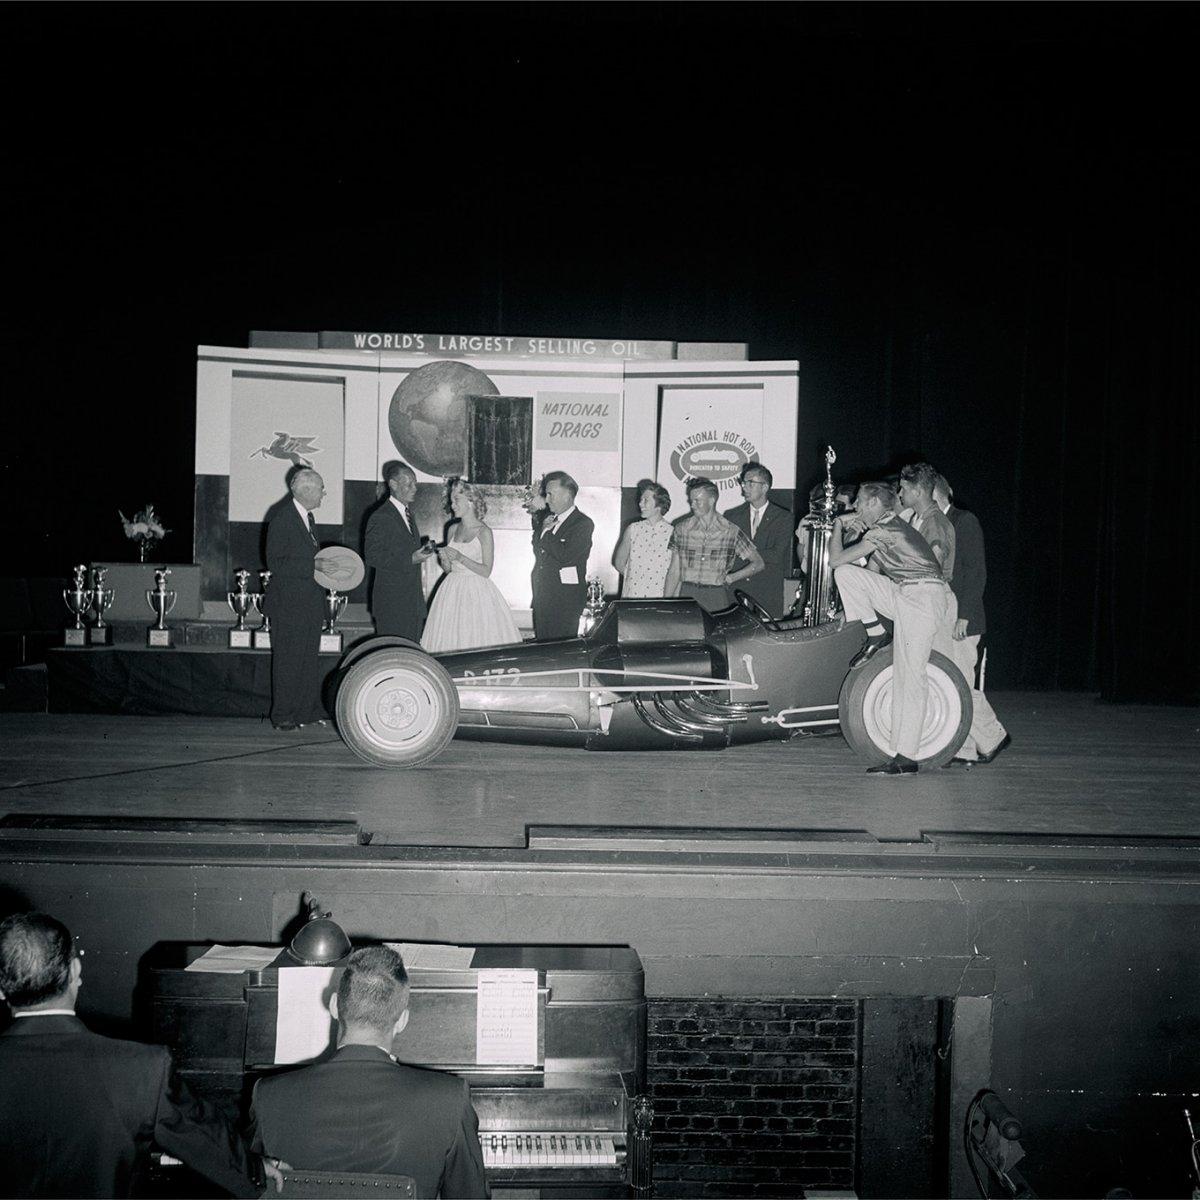 022-past-1956-stage-orchestra-top-eliminator-nhra-nationals-1989-06_19560914_ROD-copy.jpg